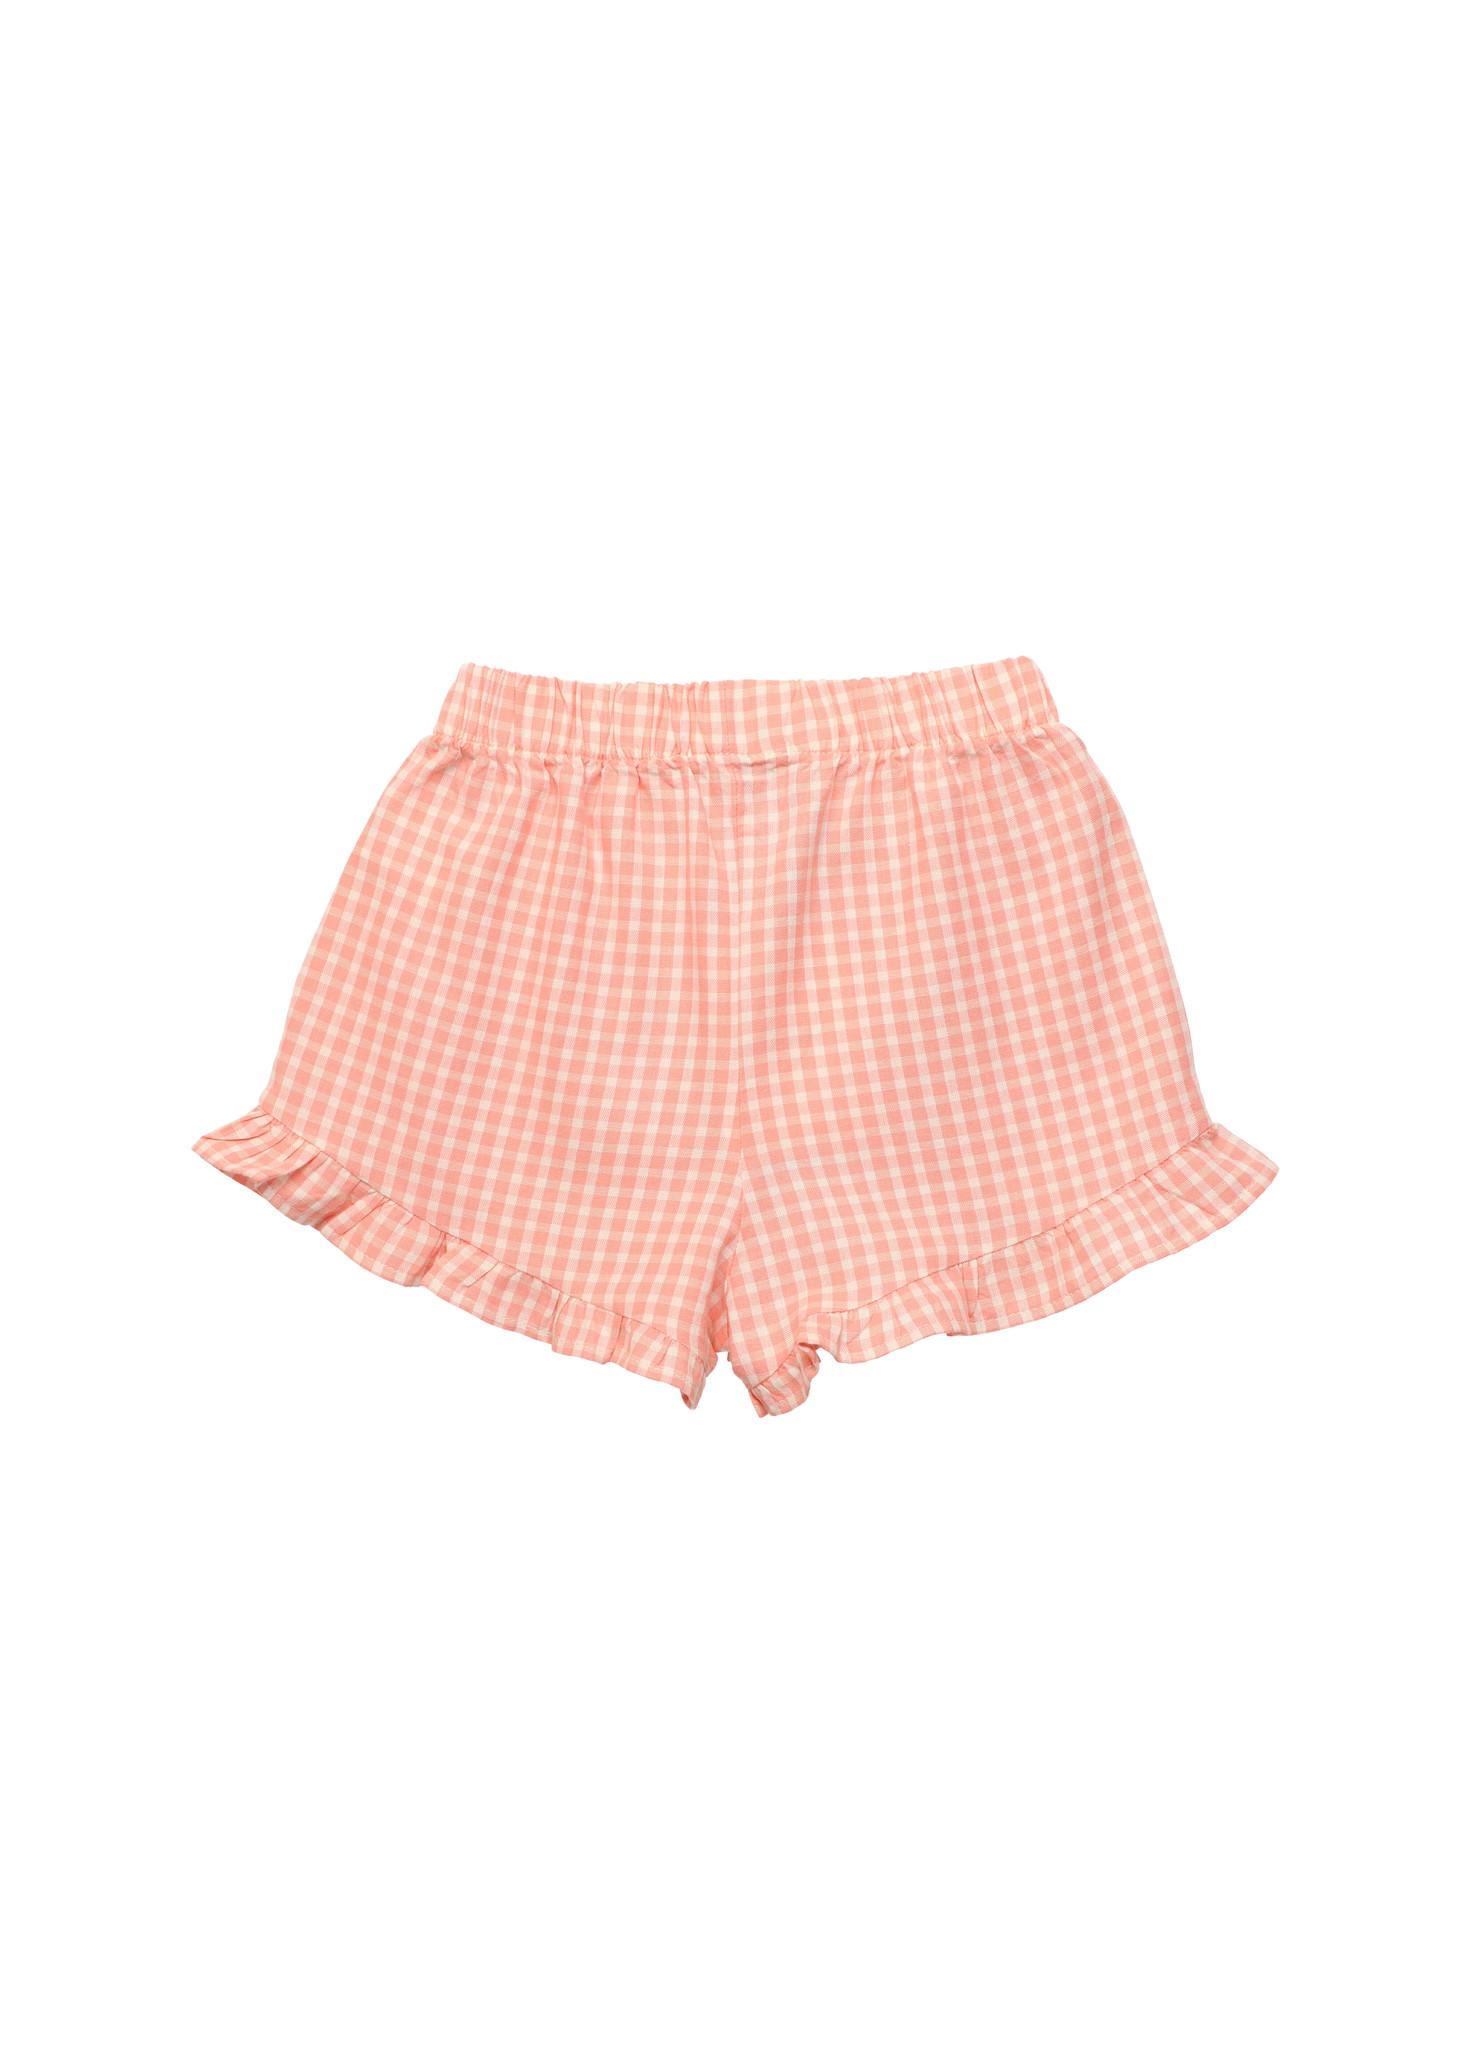 Rachel short - Coral Check-4